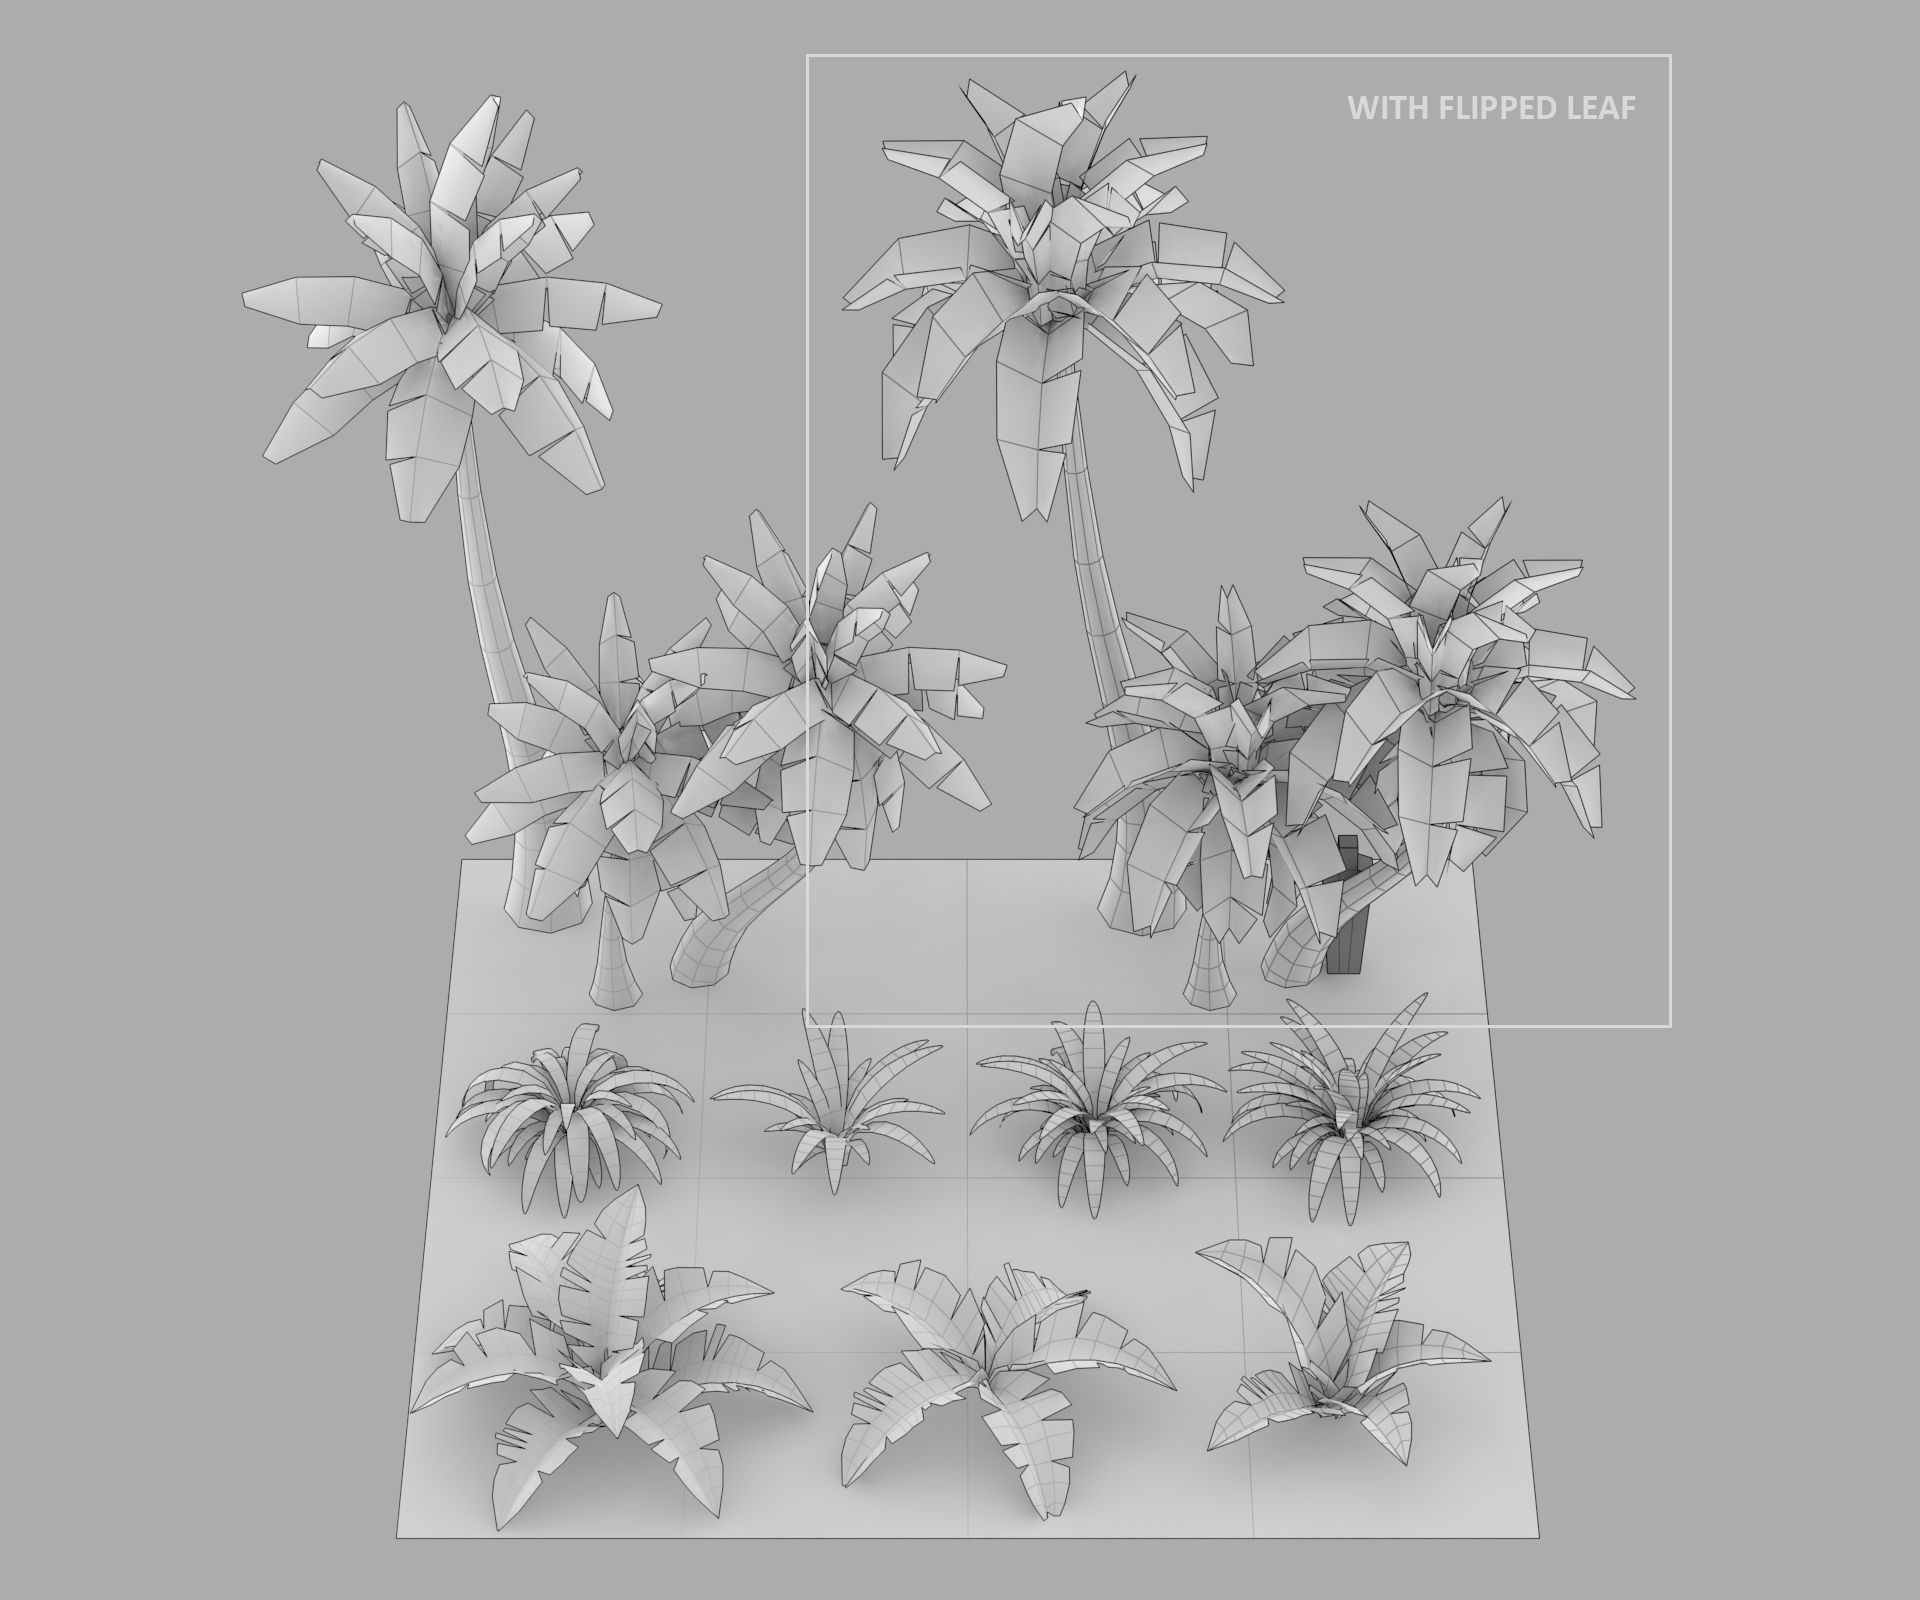 Cartoon Oasis Plants